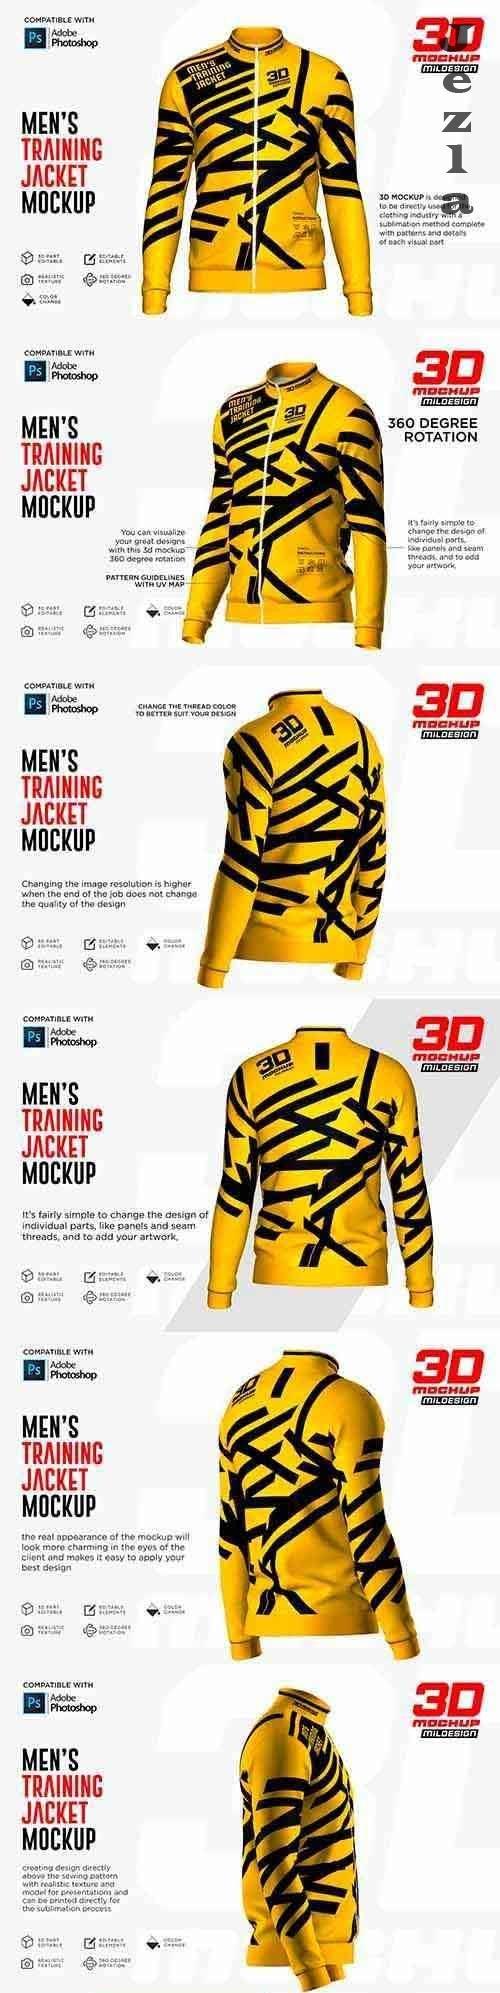 CreativeMarket - 3D Men's Training Jacket Mockup 5271763